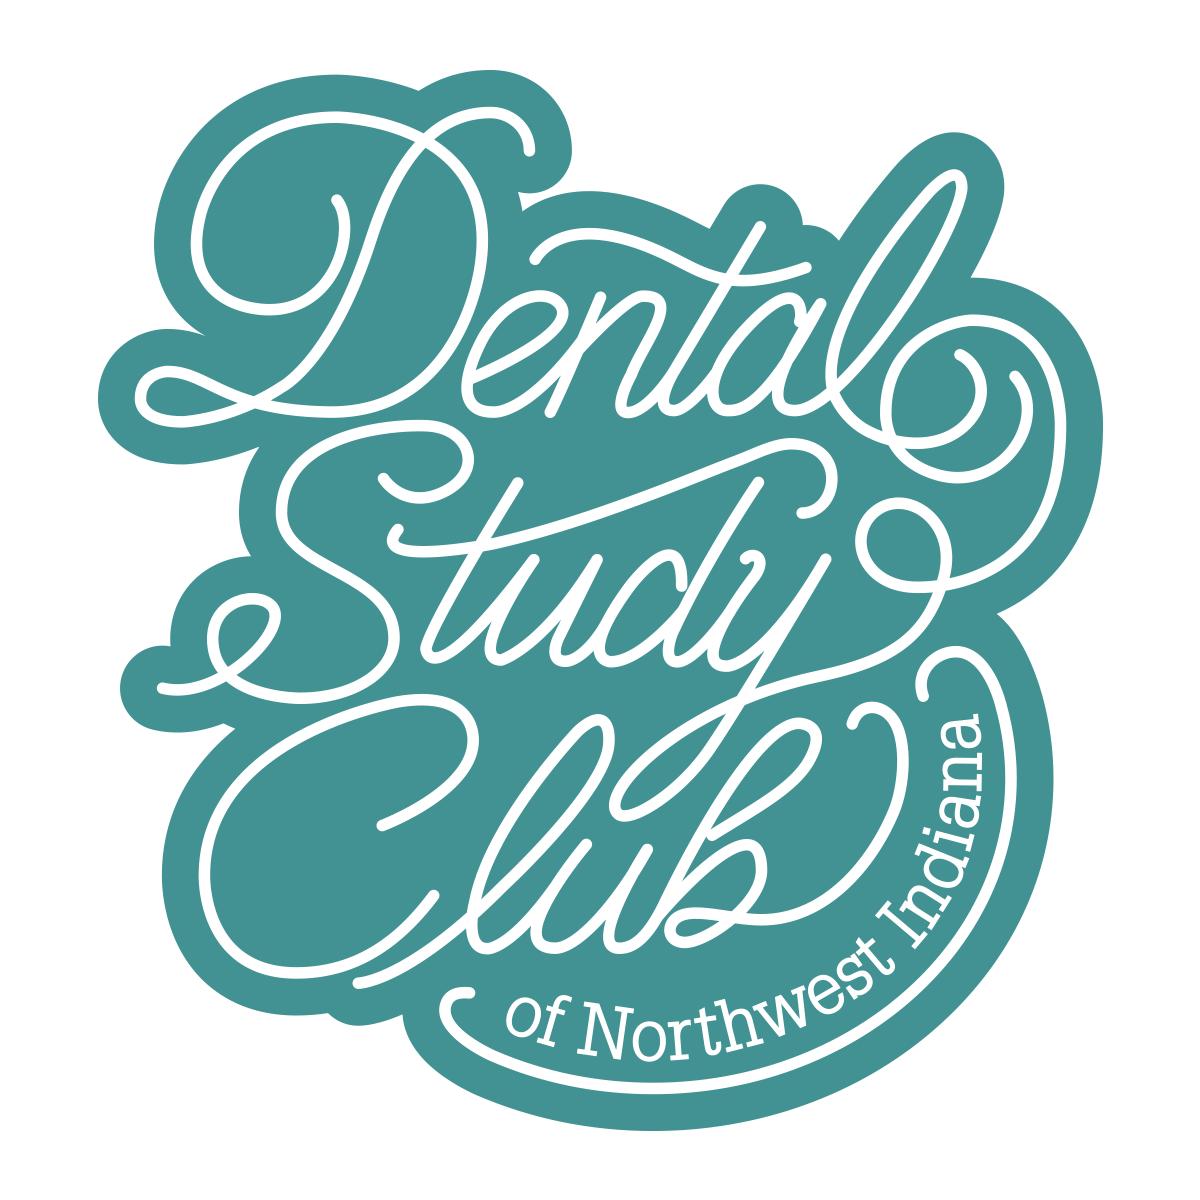 Dental Study Club of Northwest Indiana